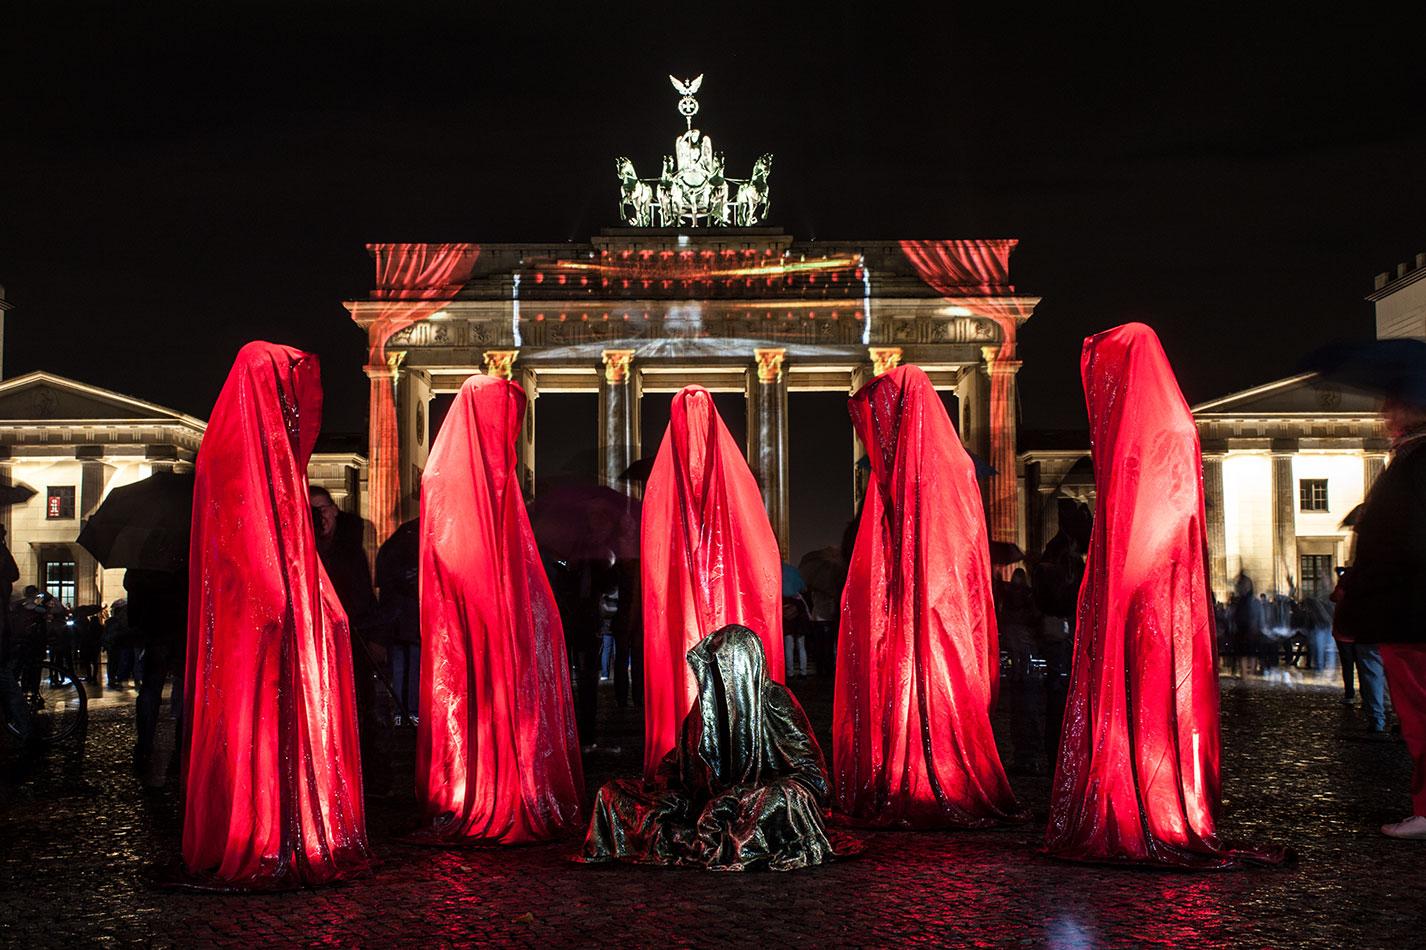 festival-of-lights-berlin-brandenburg-gate-light-art-show-exhibition-lumina-guardians-of-time-manfred-kili-kielnhofer-contemporary-arts-design-sculpture-3281